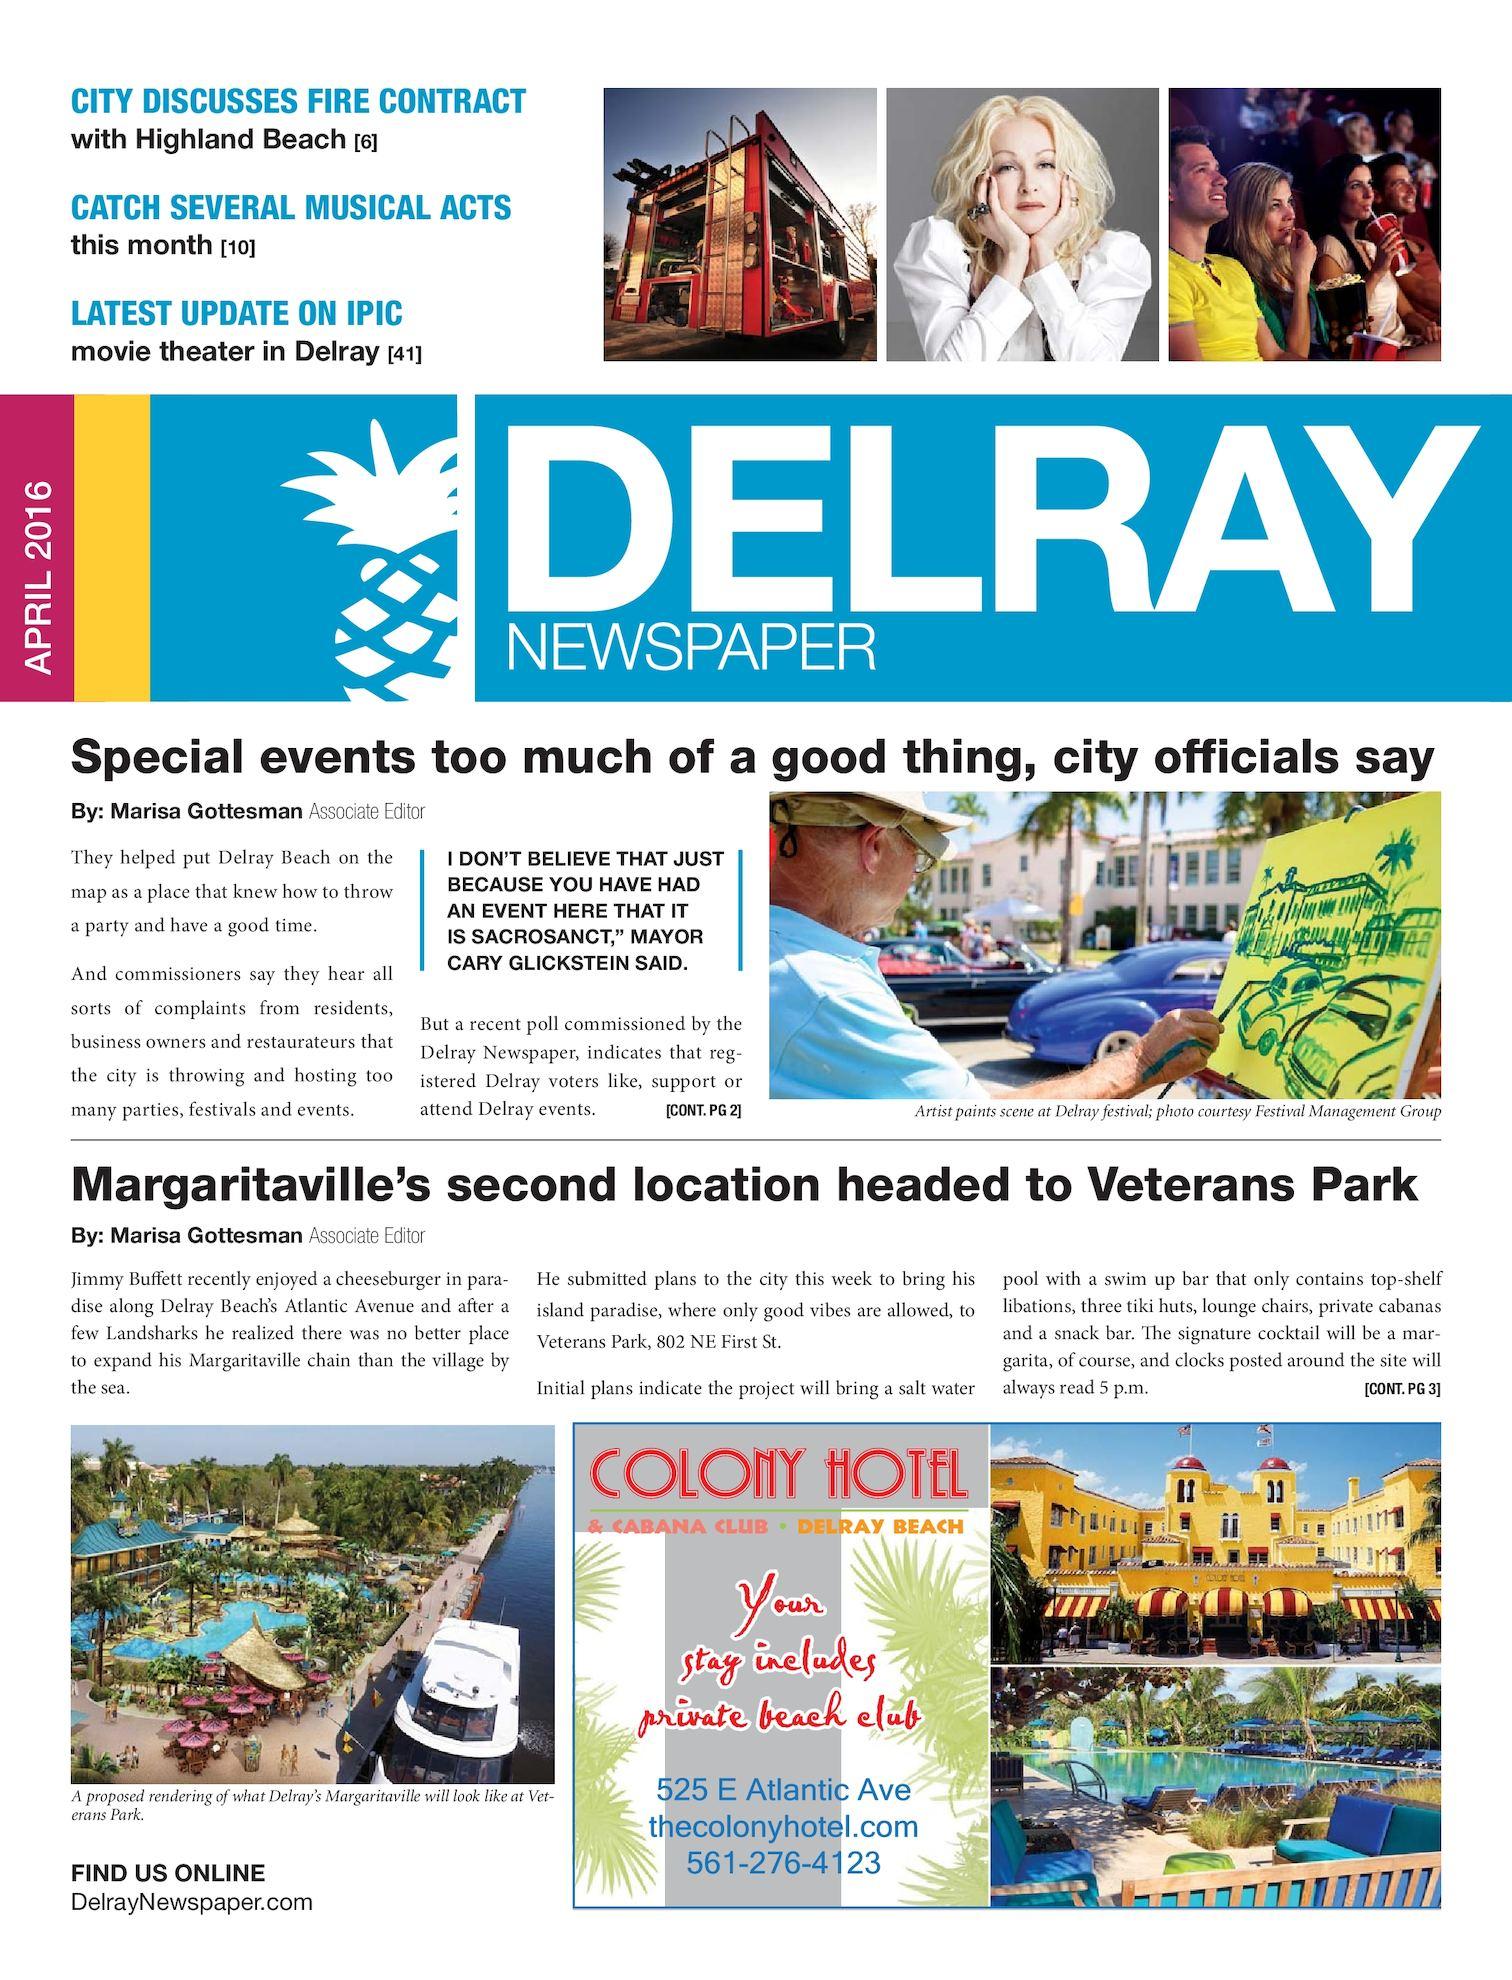 ba56847da8f Calaméo - Delray newspaper